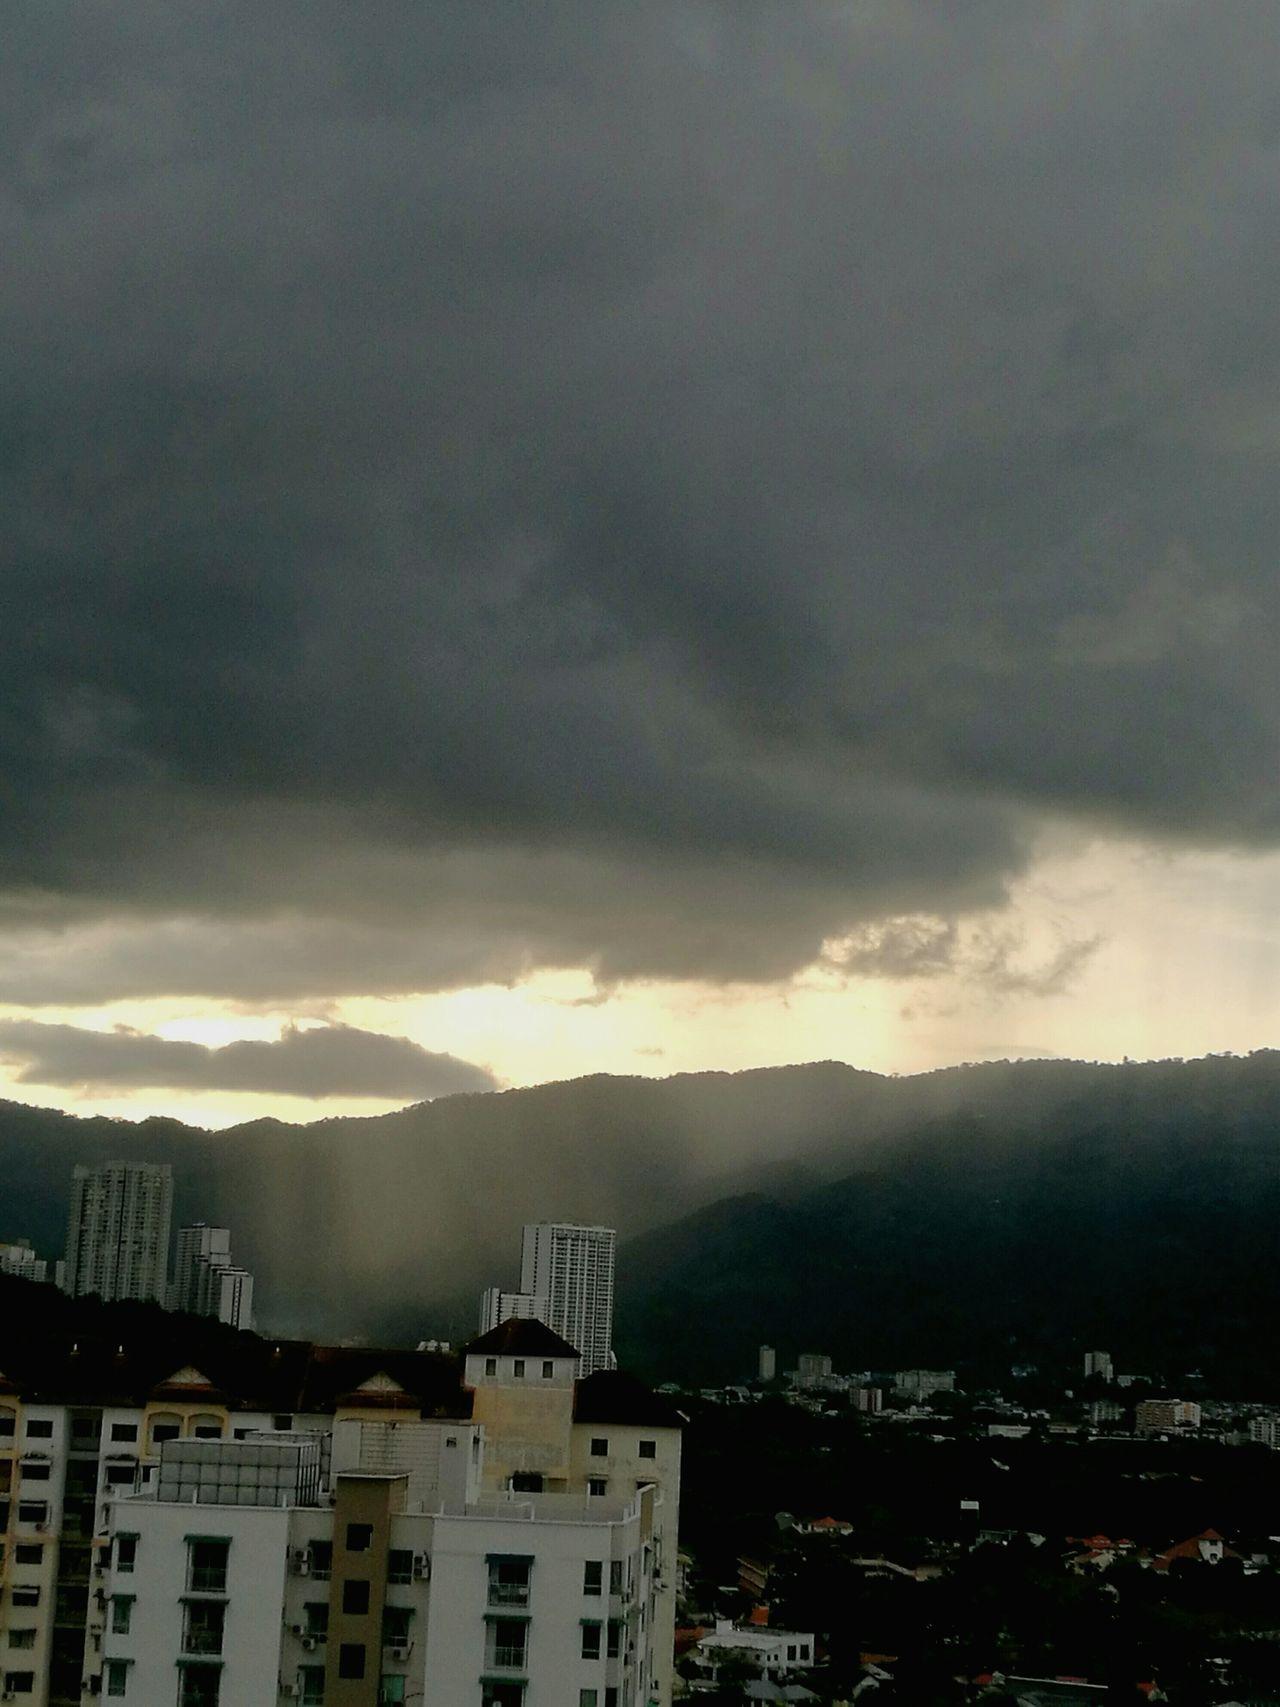 Storm Cloud Storm Grey Sky Grey Clouds Sunrays No People Outdoors Nature Cityscape Sky Cloud - Sky Gloomy Weather